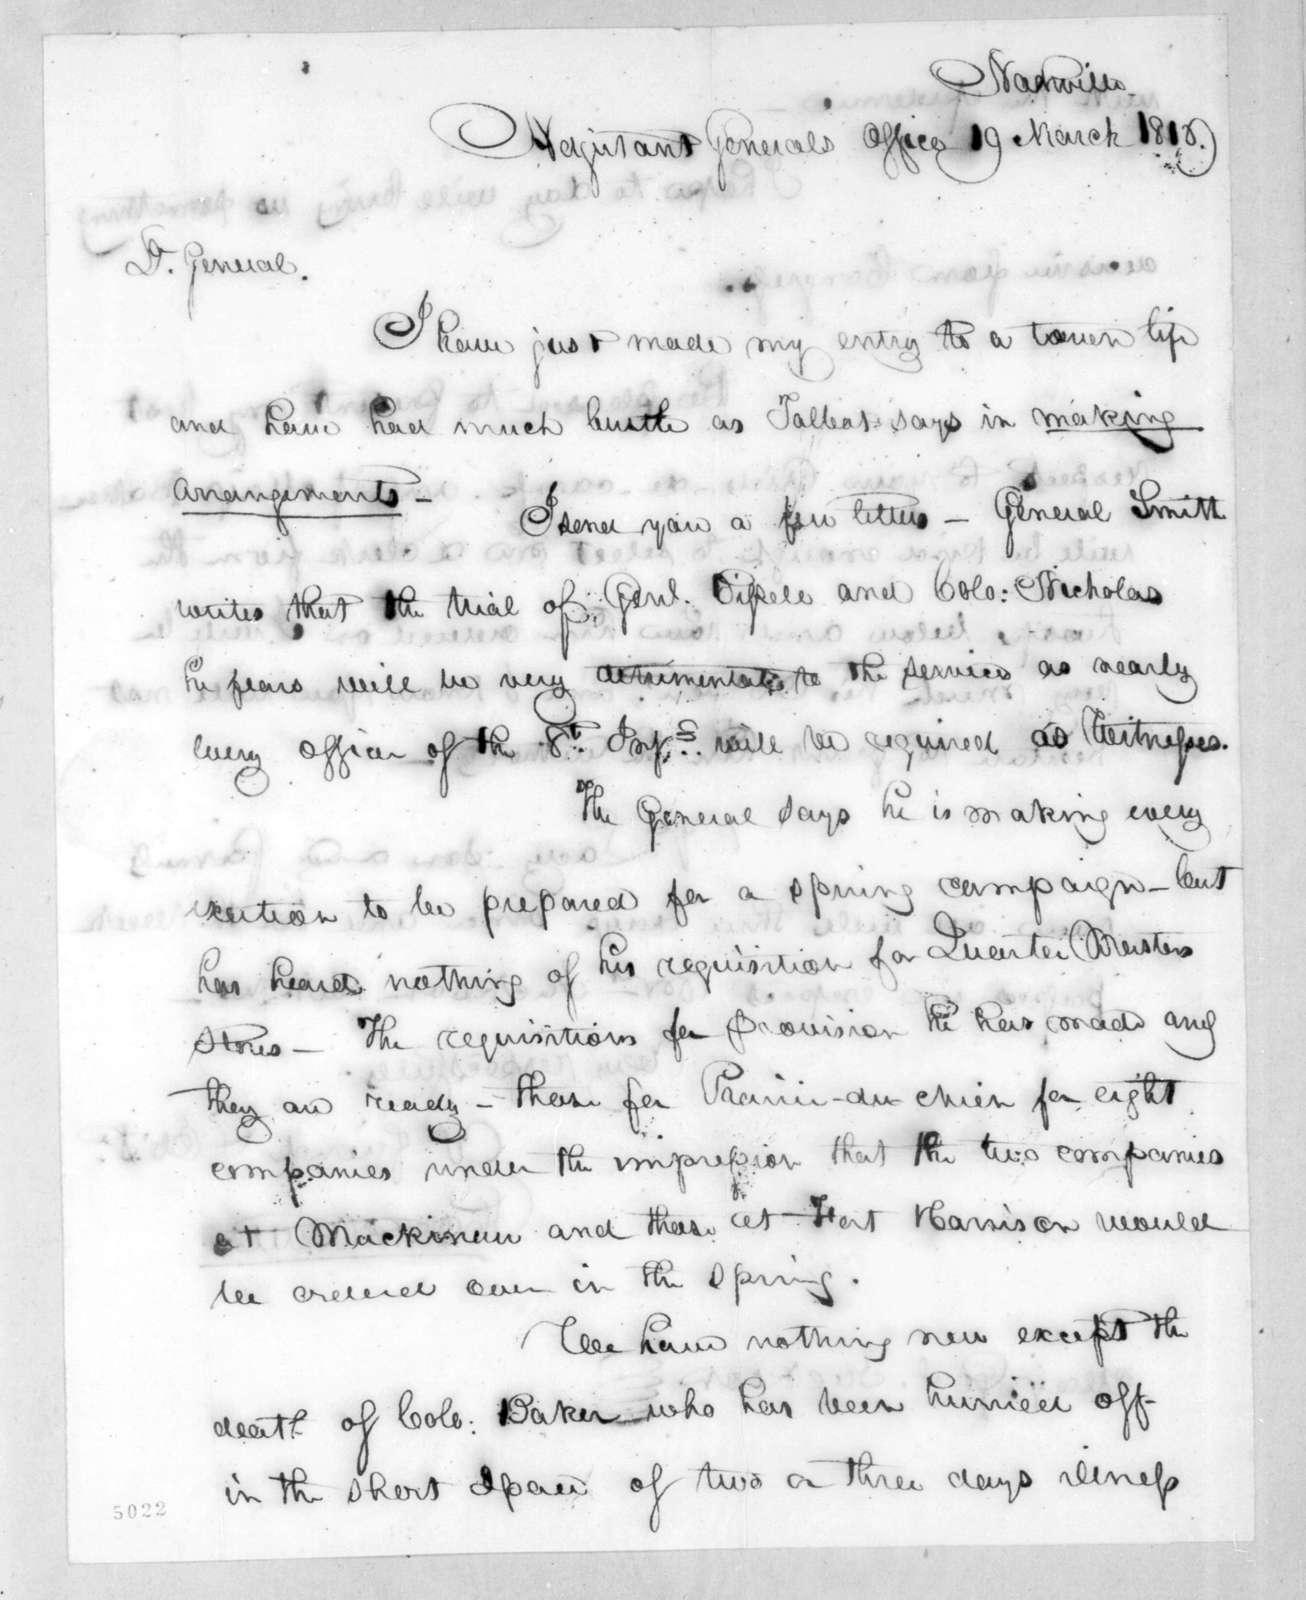 Robert Butler to Andrew Jackson, March 19, 1816